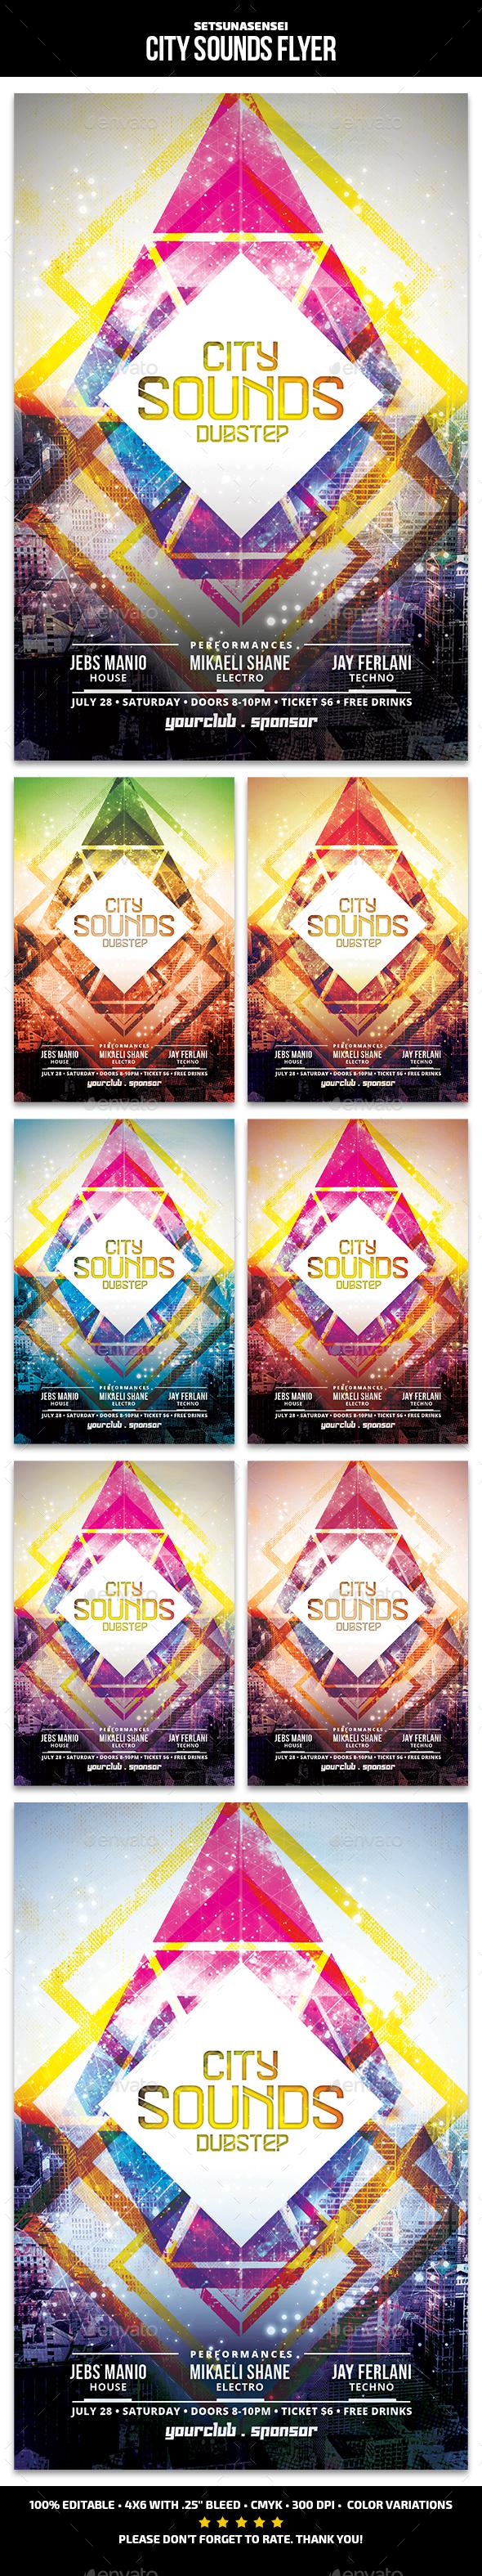 City Sounds Flyer - Clubs & Parties Events